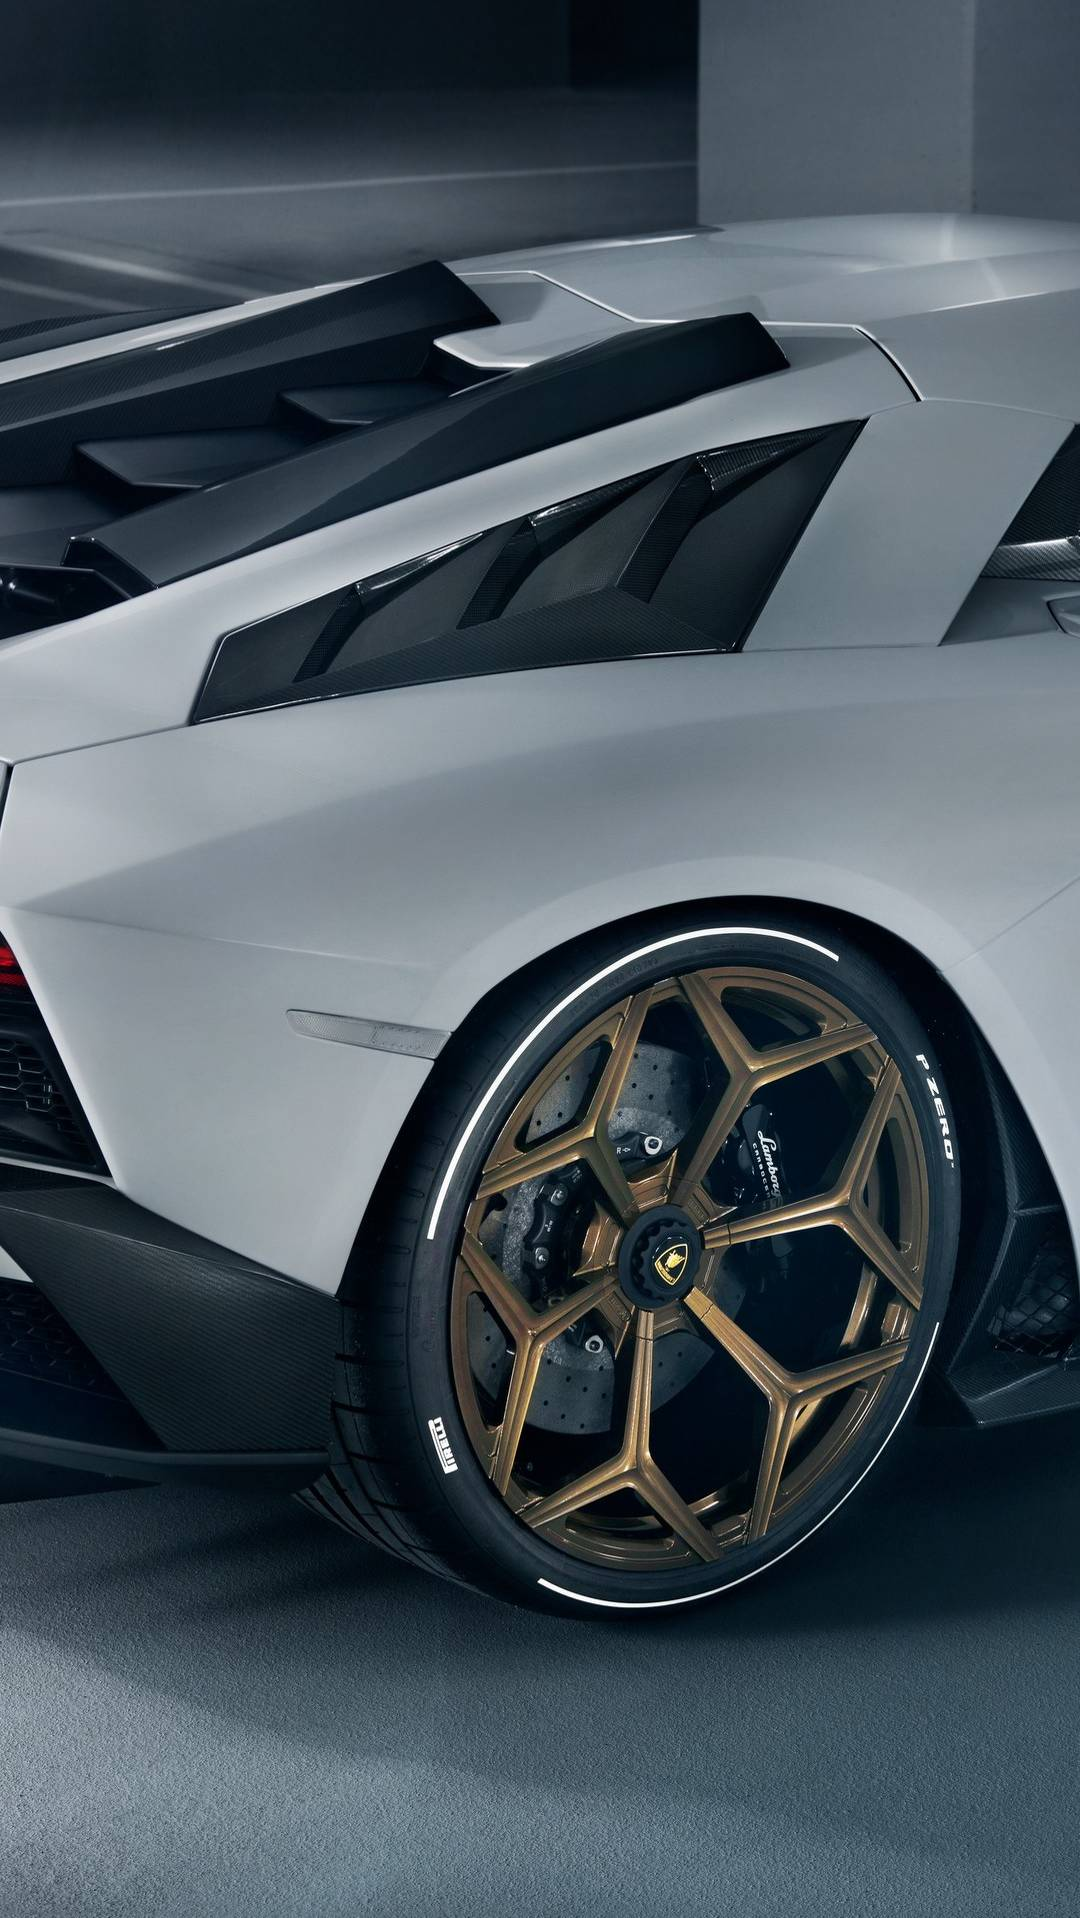 Lamborghini Aventador S By Novitec Adds Lightness And Power